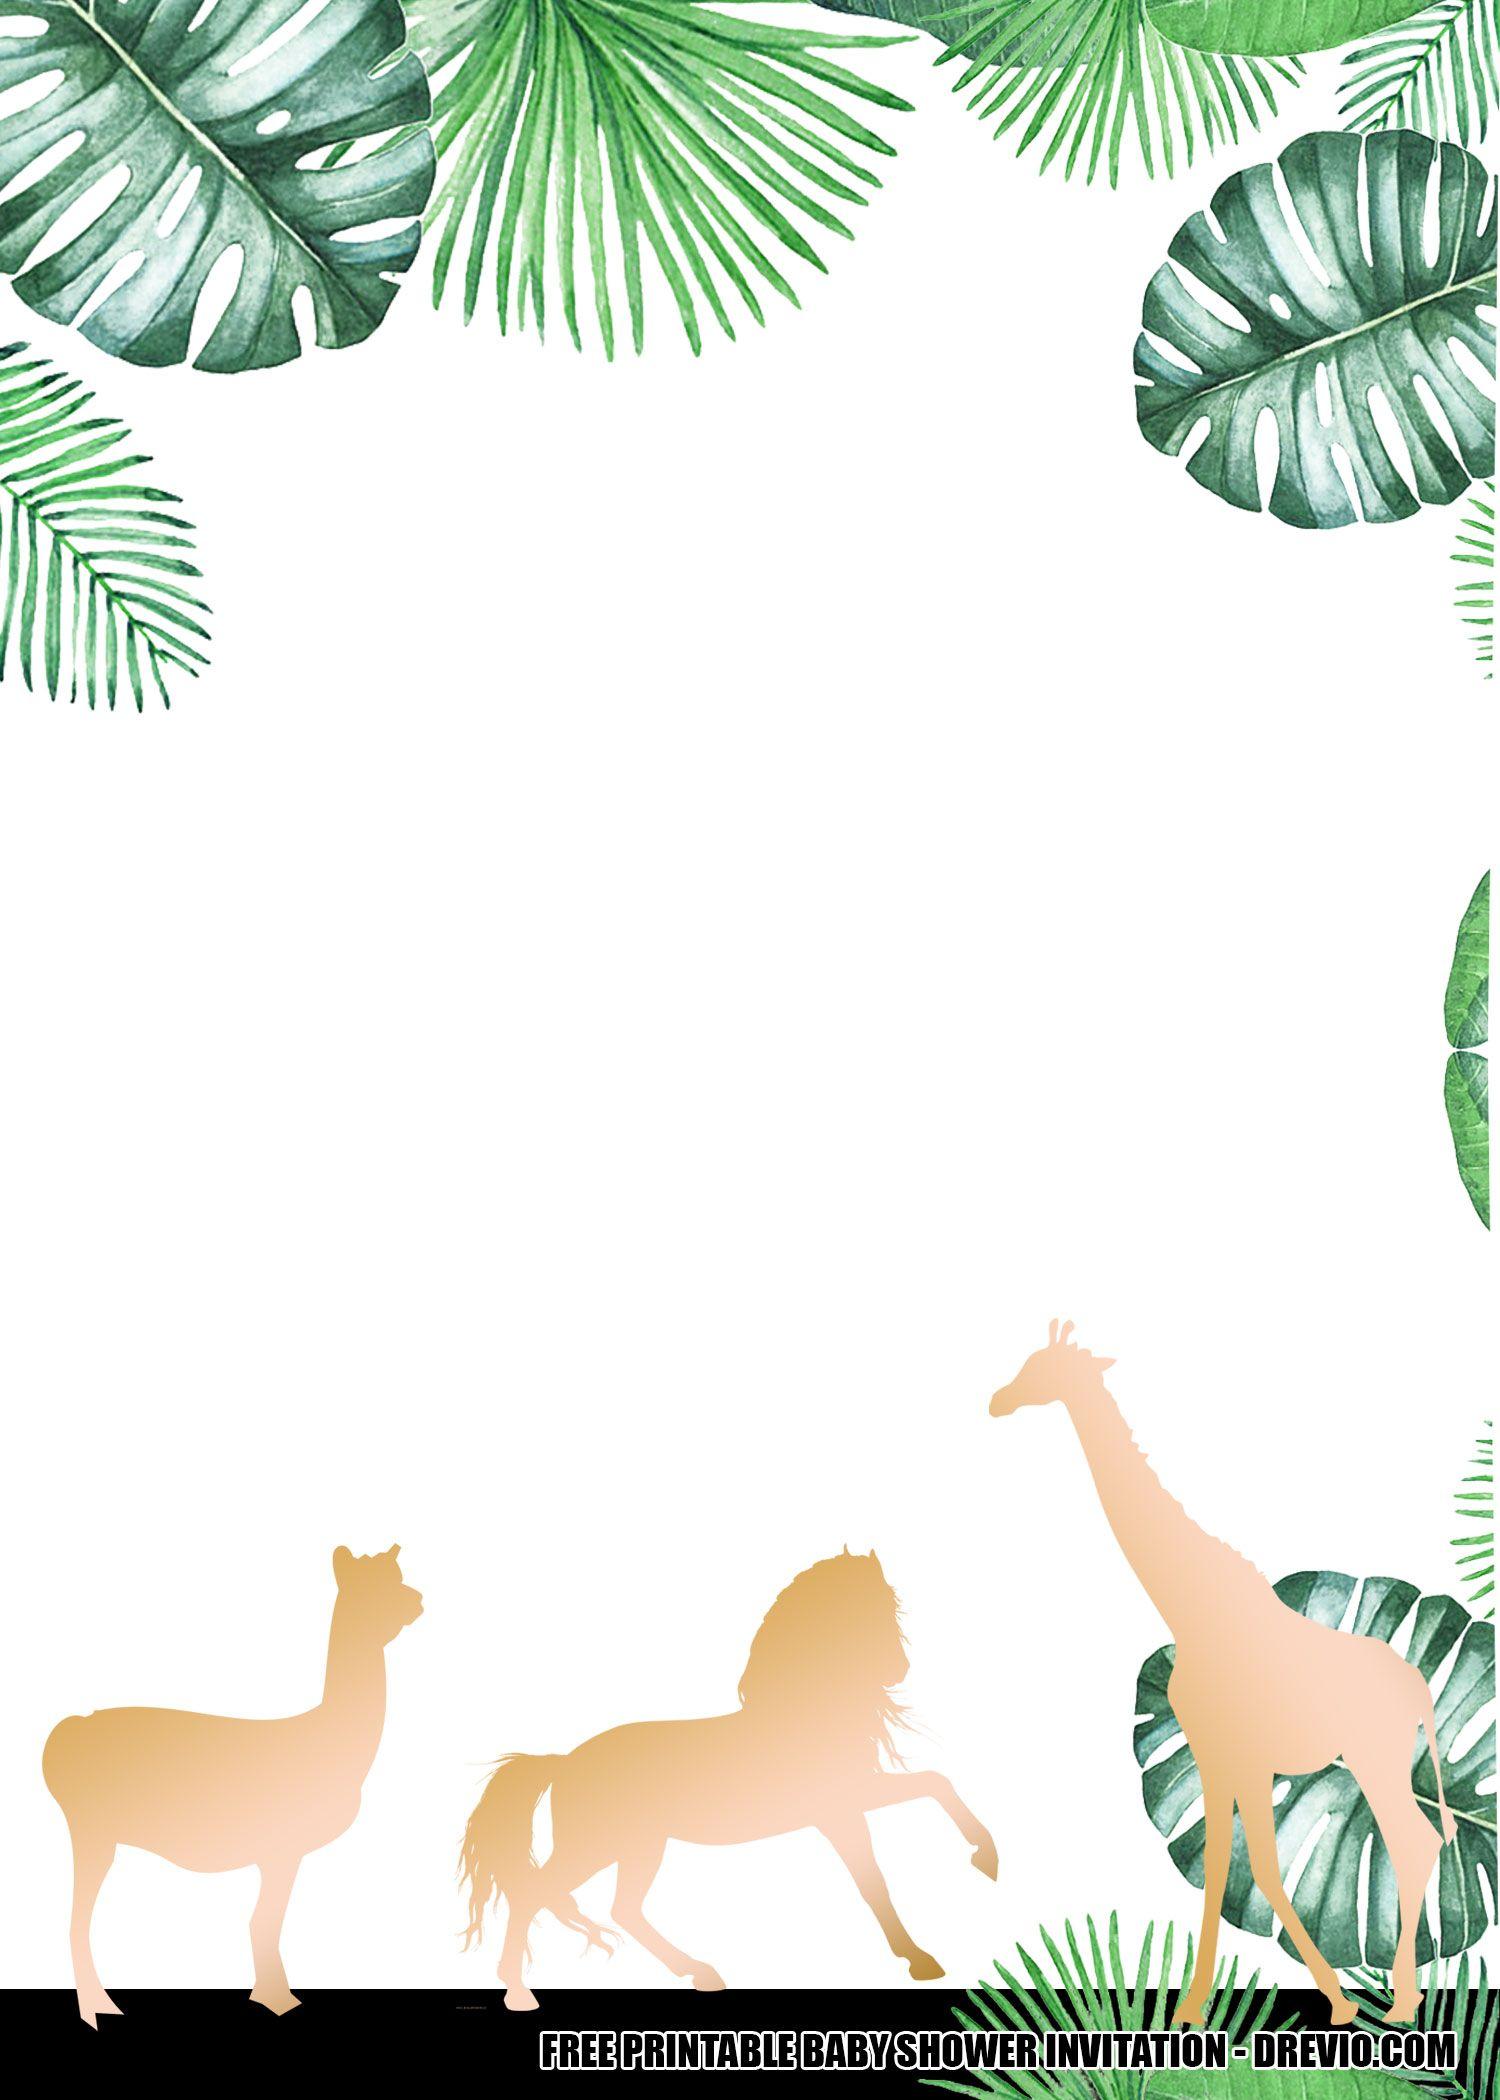 11 Free Jungle Gold Baby Shower Invitation Templates Gold Baby Shower Invitations Baby Shower Invitations Baby Shower Invitation Templates Safari baby shower invitations template